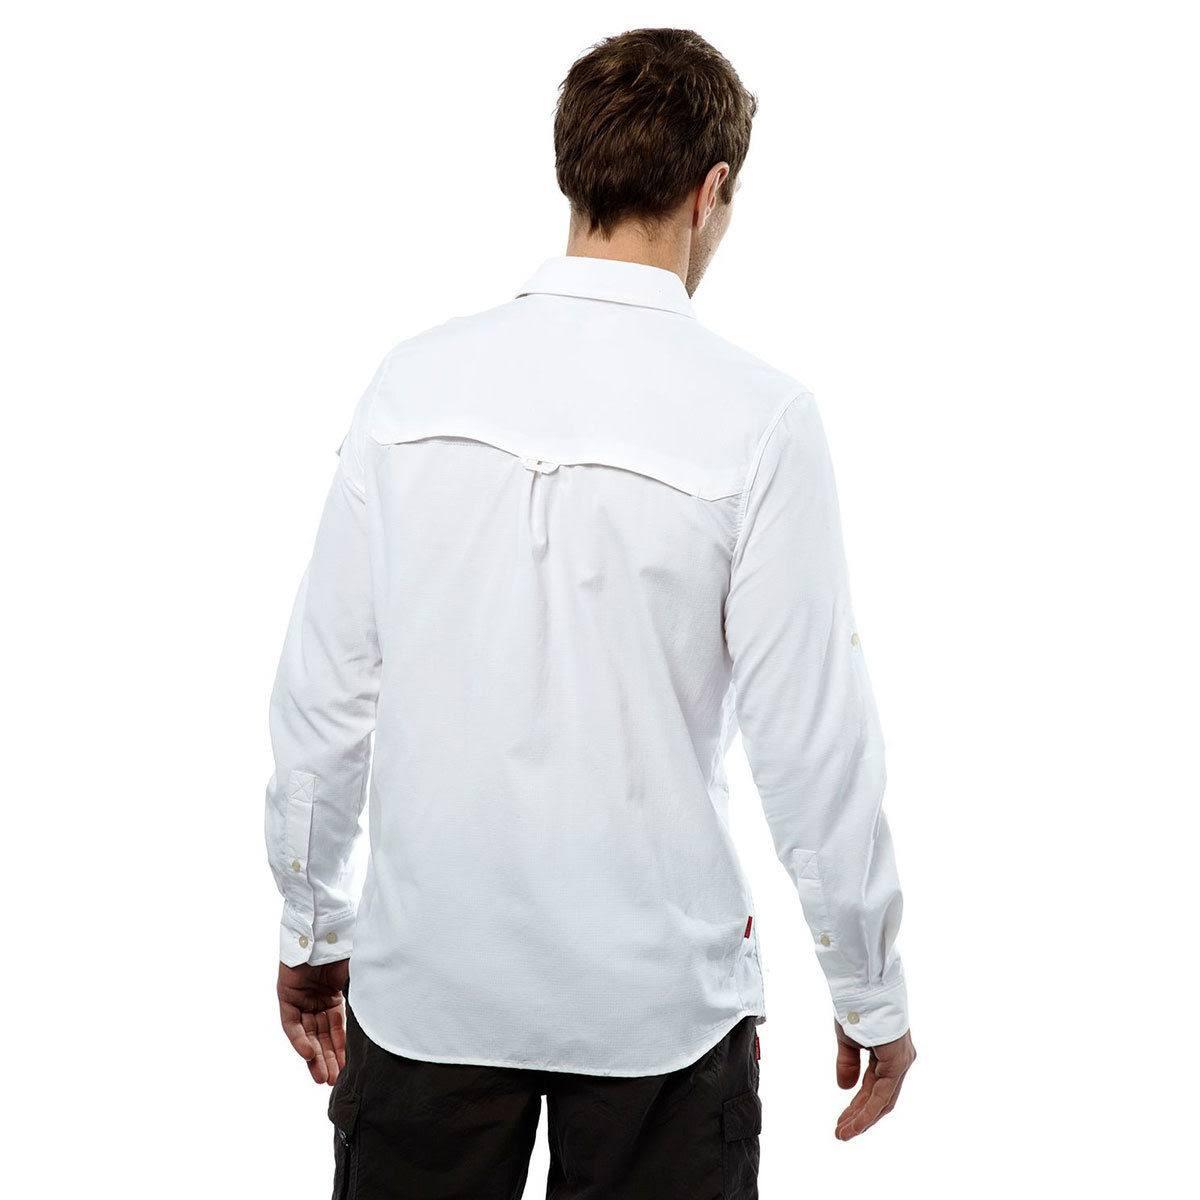 Nl Adv Craghoppers Cms597 White Xl Manga Larga 3er80 Optic Camiseta De xwAnqXCBAI